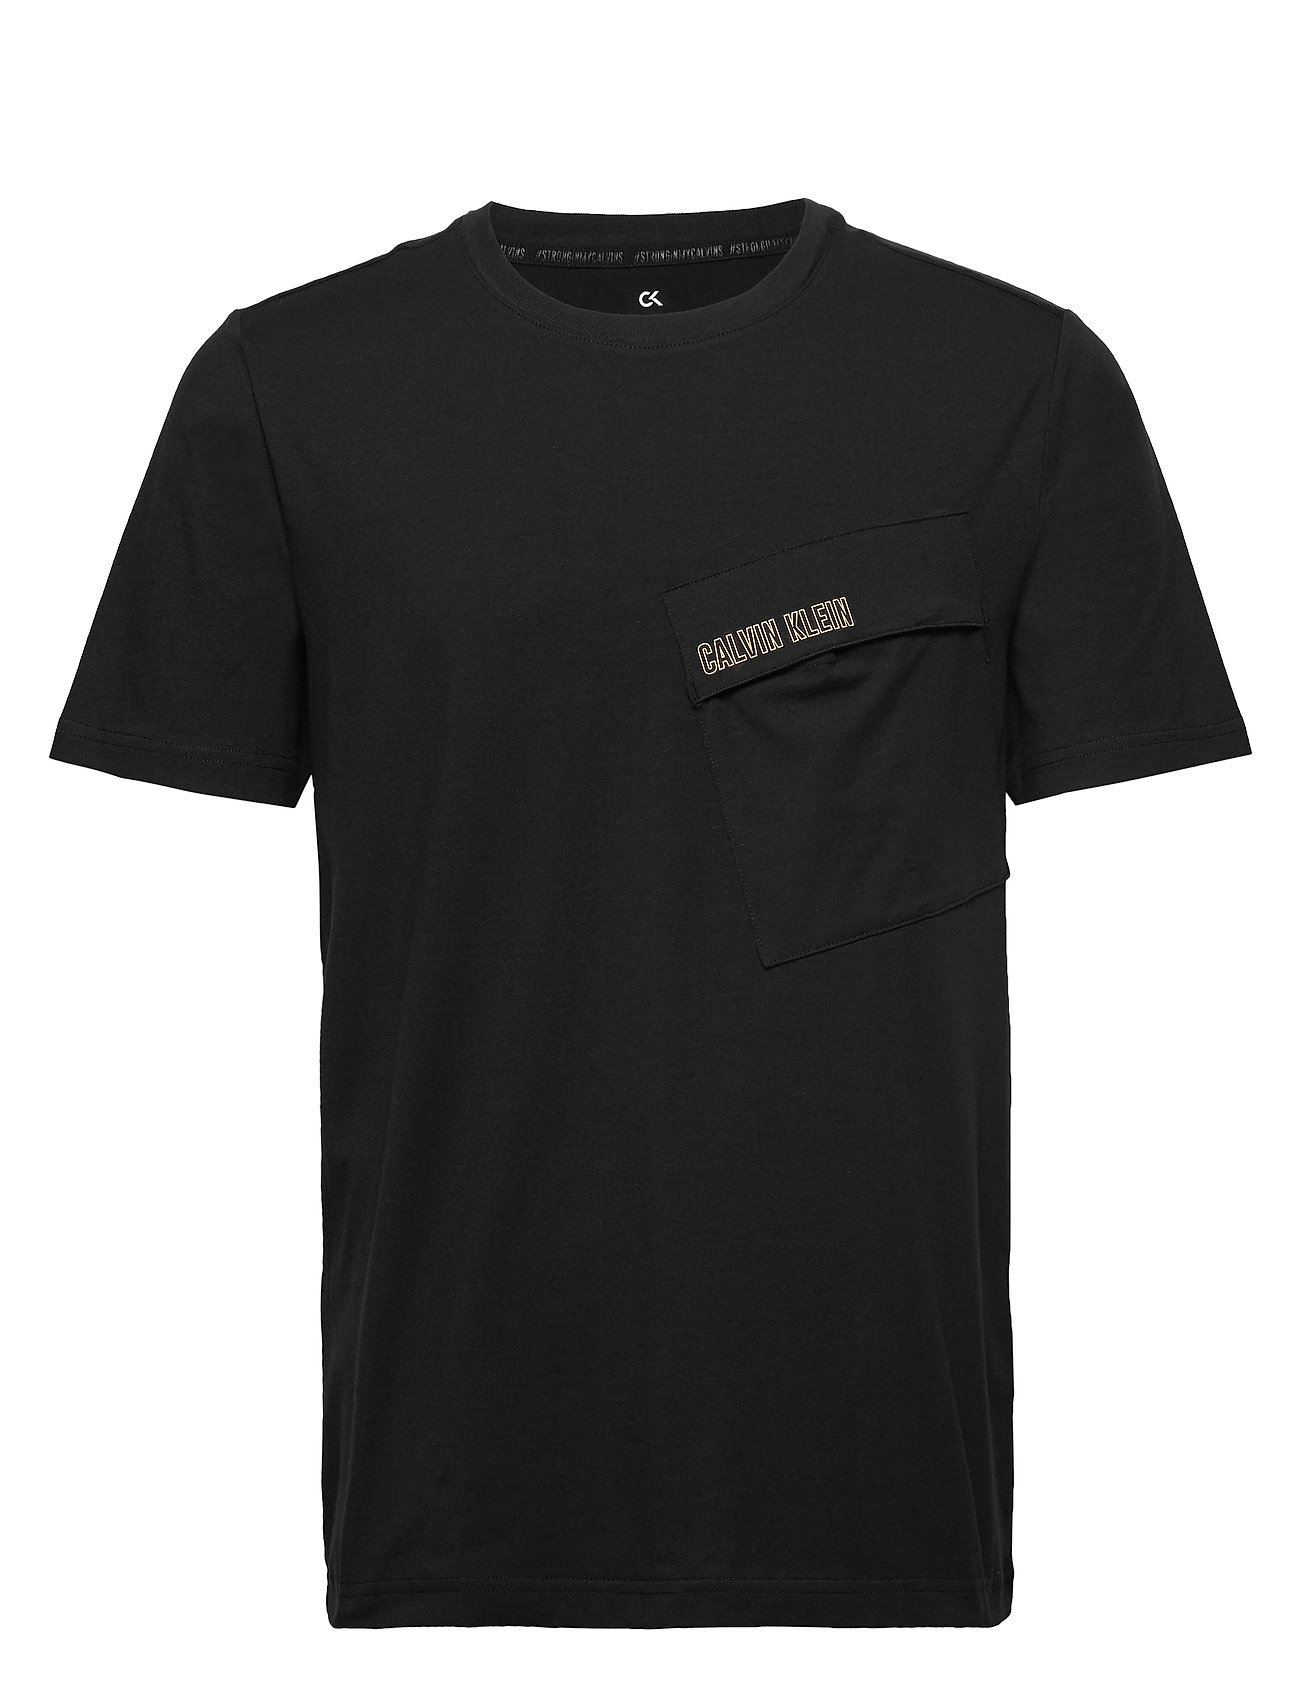 Image of Short Sleeve T-Shirt T-shirt Sort Calvin Klein Performance (3339881881)